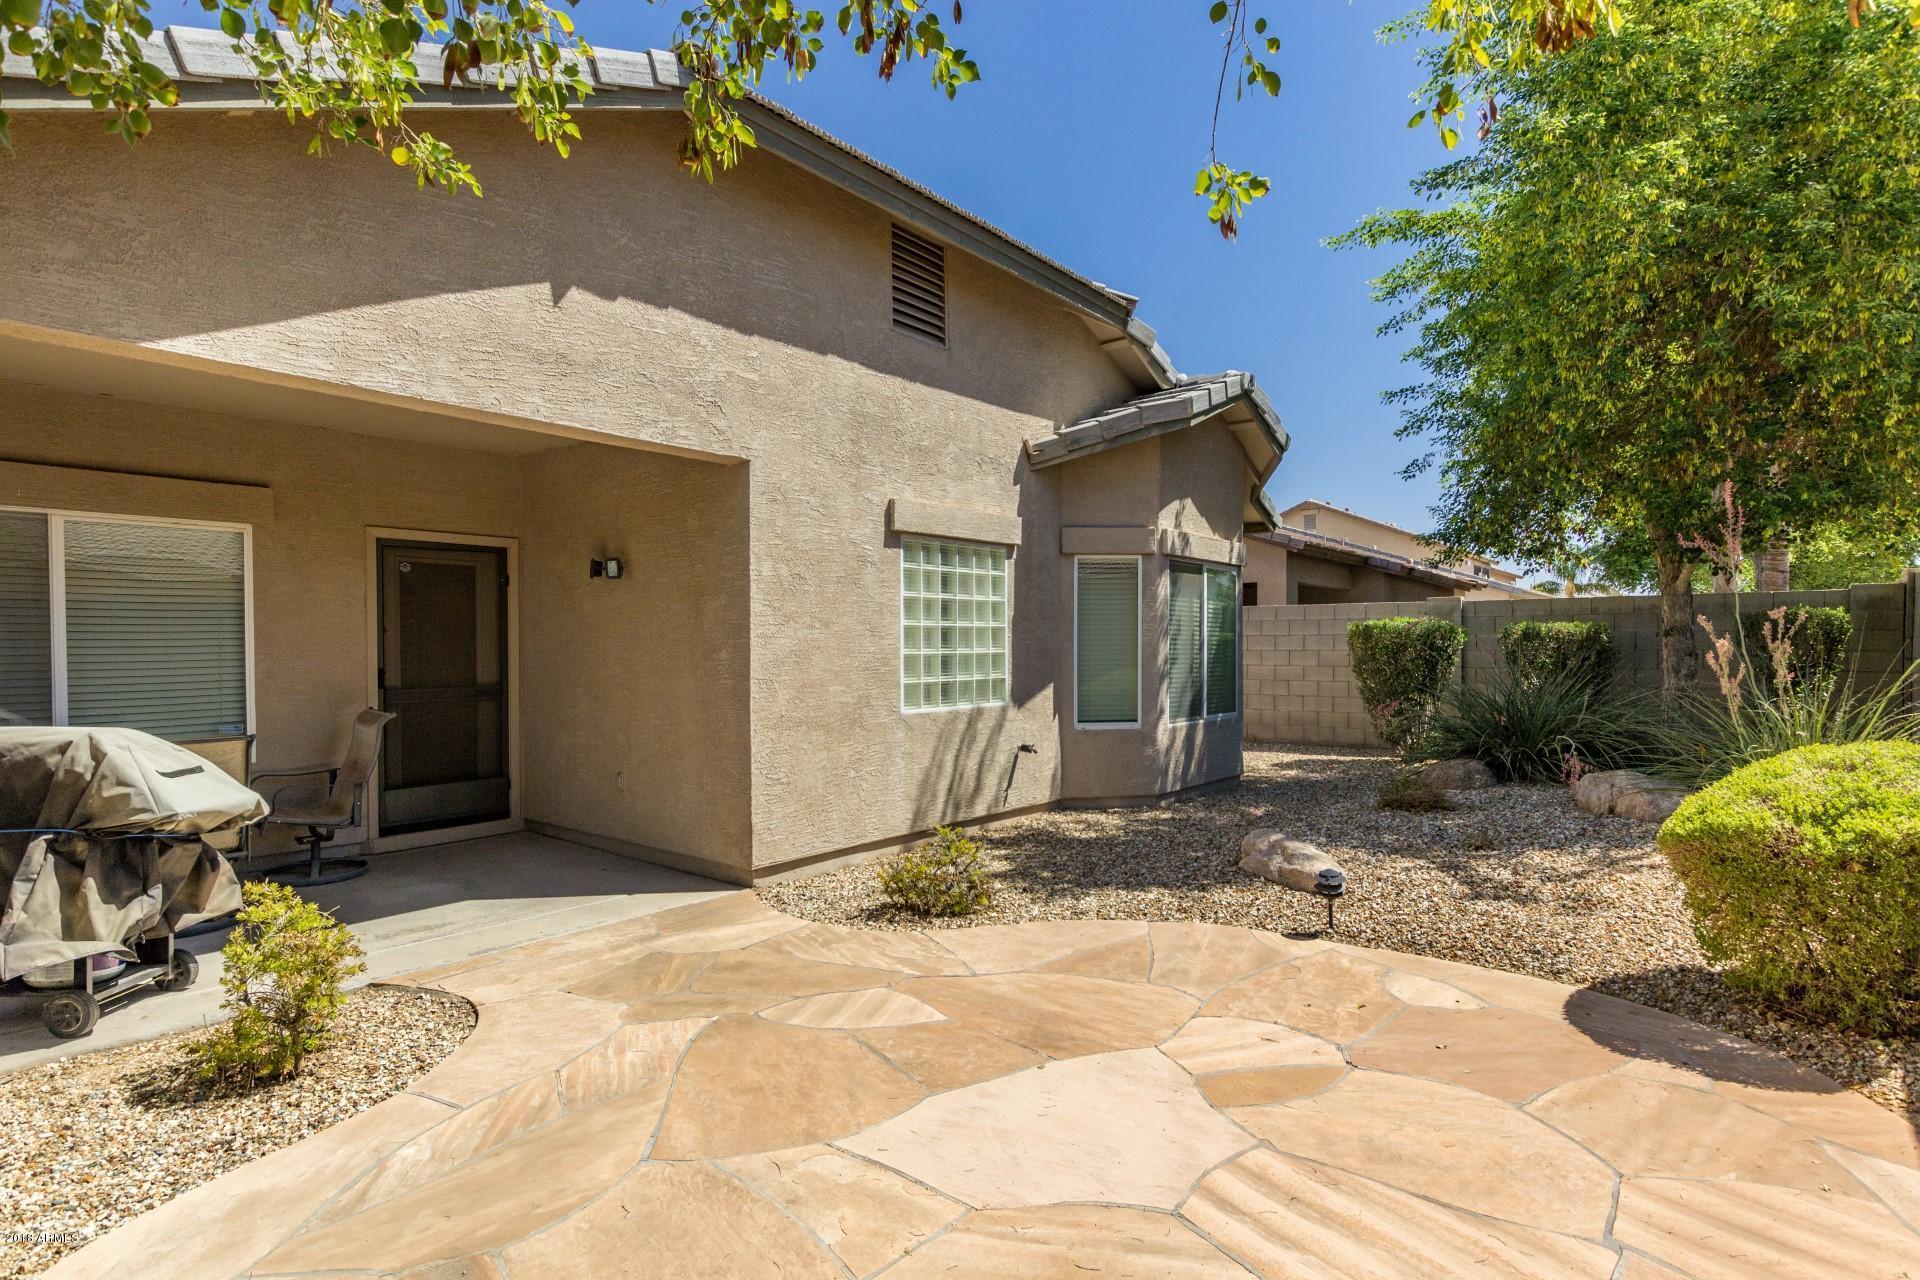 MLS 5786147 11637 W ADAMS Street, Avondale, AZ Avondale AZ Luxury